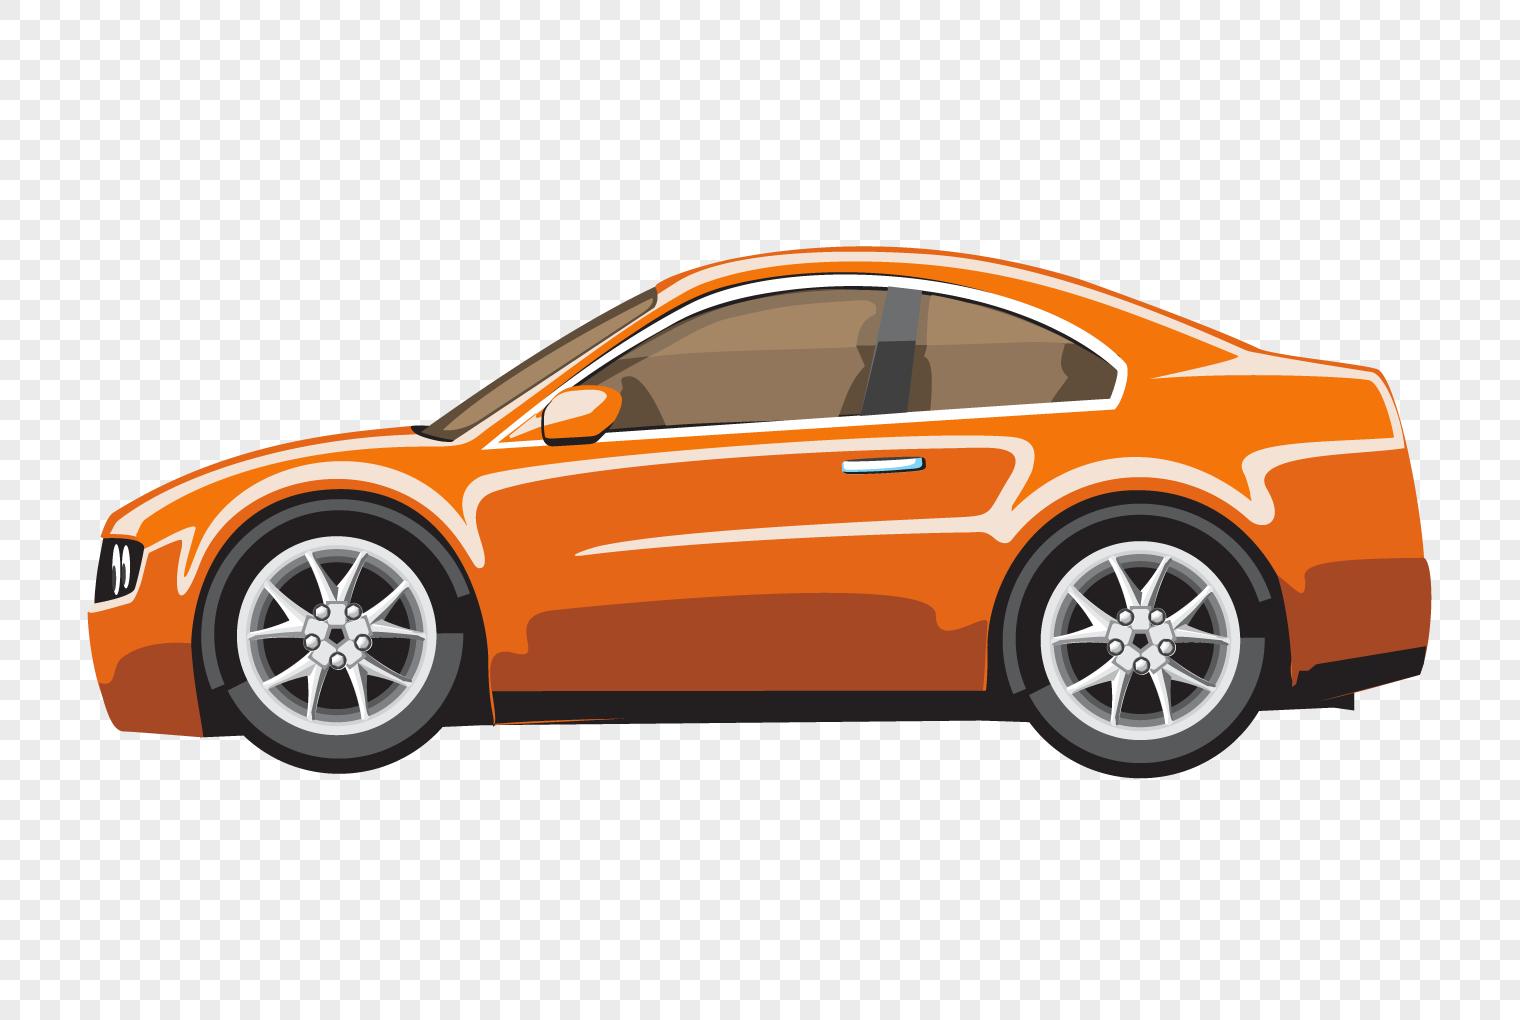 Vektor Pola Dekorasi Mobil Kartun Gambar Unduh Gratis Grafik